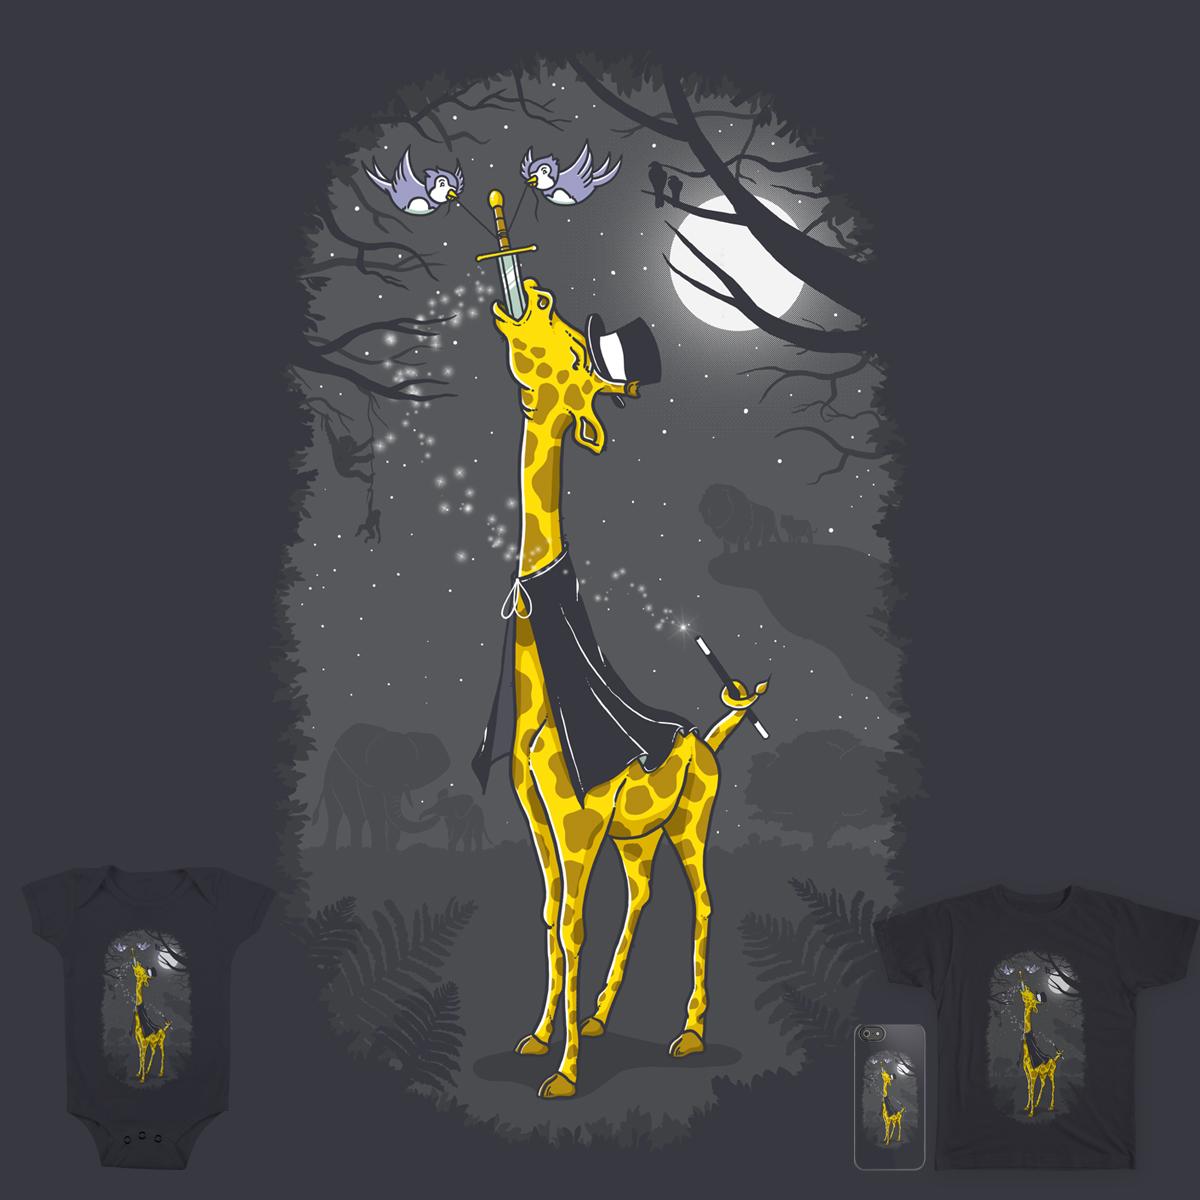 The Midnight Circus by yortsiraulo on Threadless